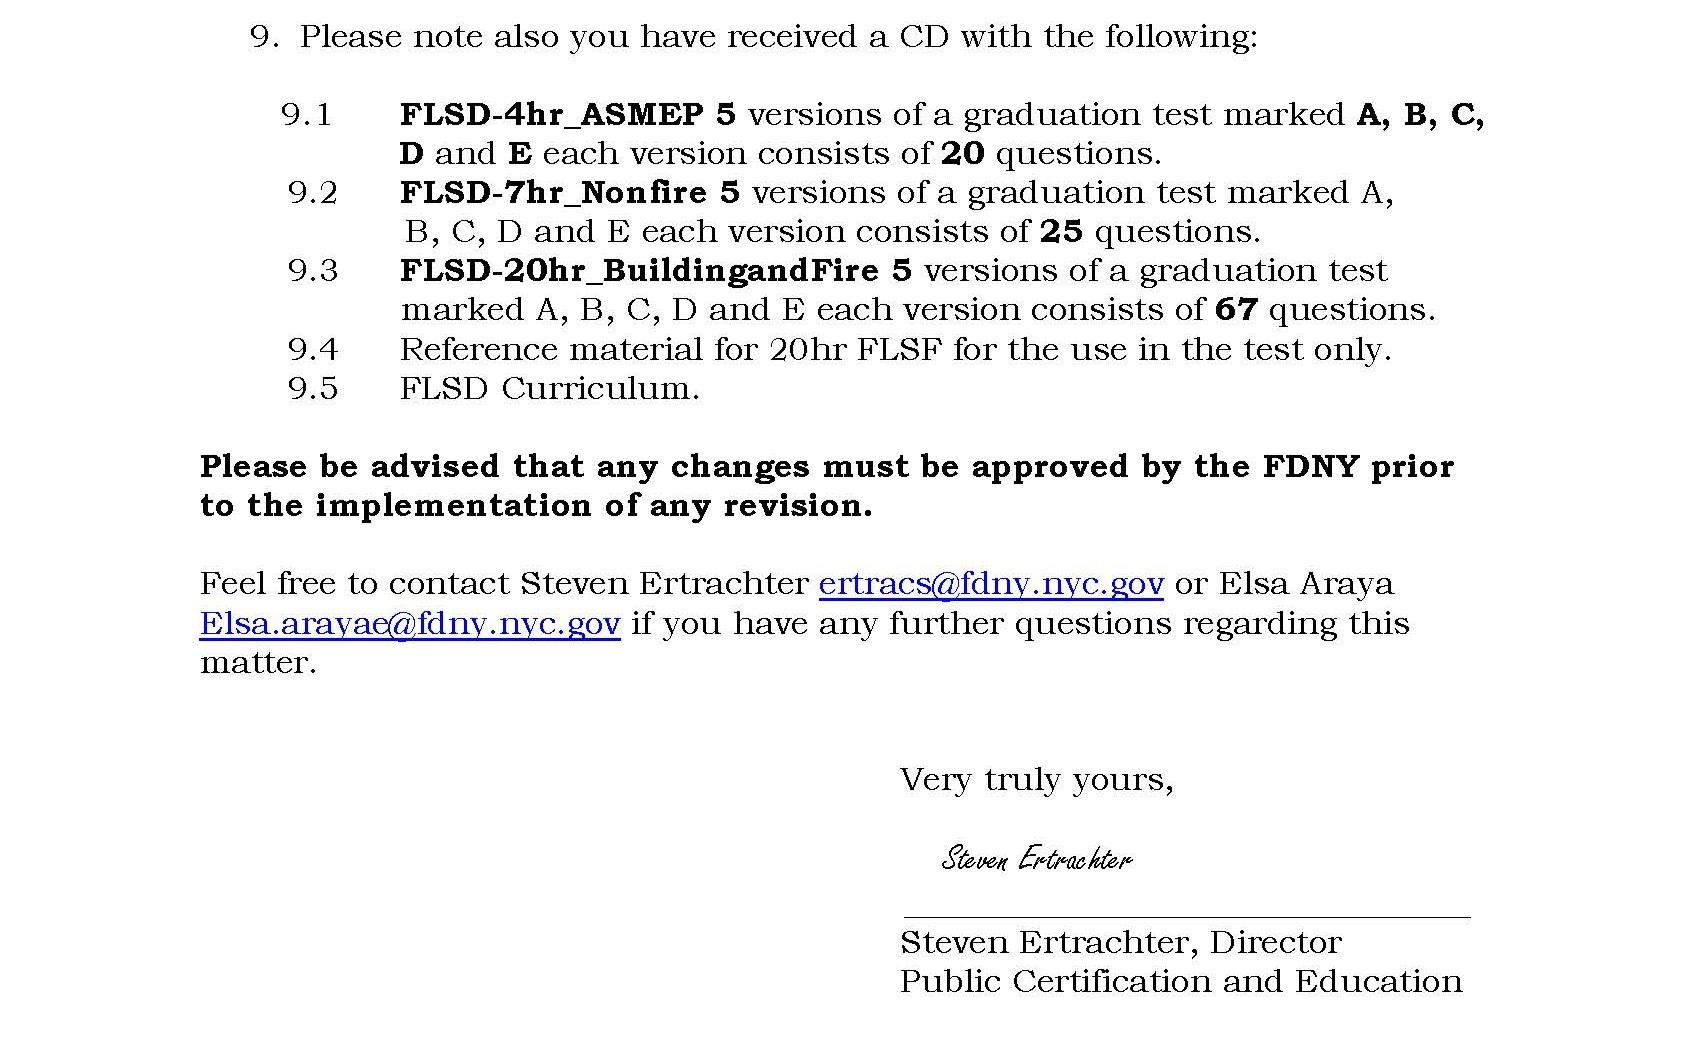 Tauris+Tech+LLC+Letter+of+Acceptance+for+FLSD+course+3-25-19+%281%29_Page_2.jpg